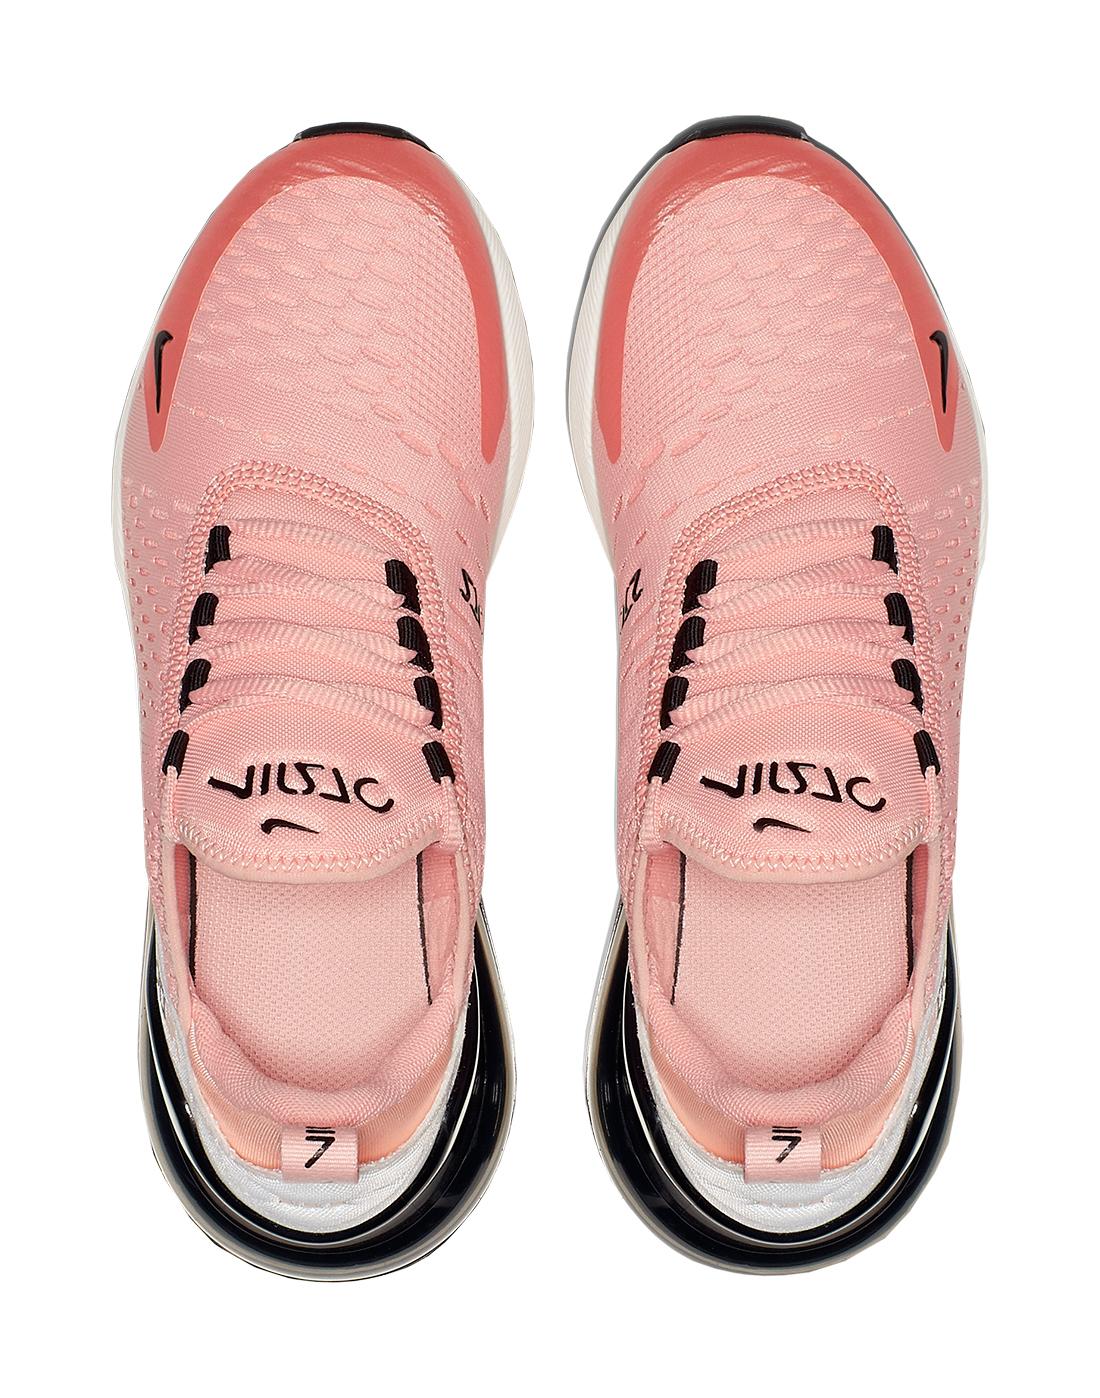 Girl's Pink \u0026 Black Nike Air Max 270